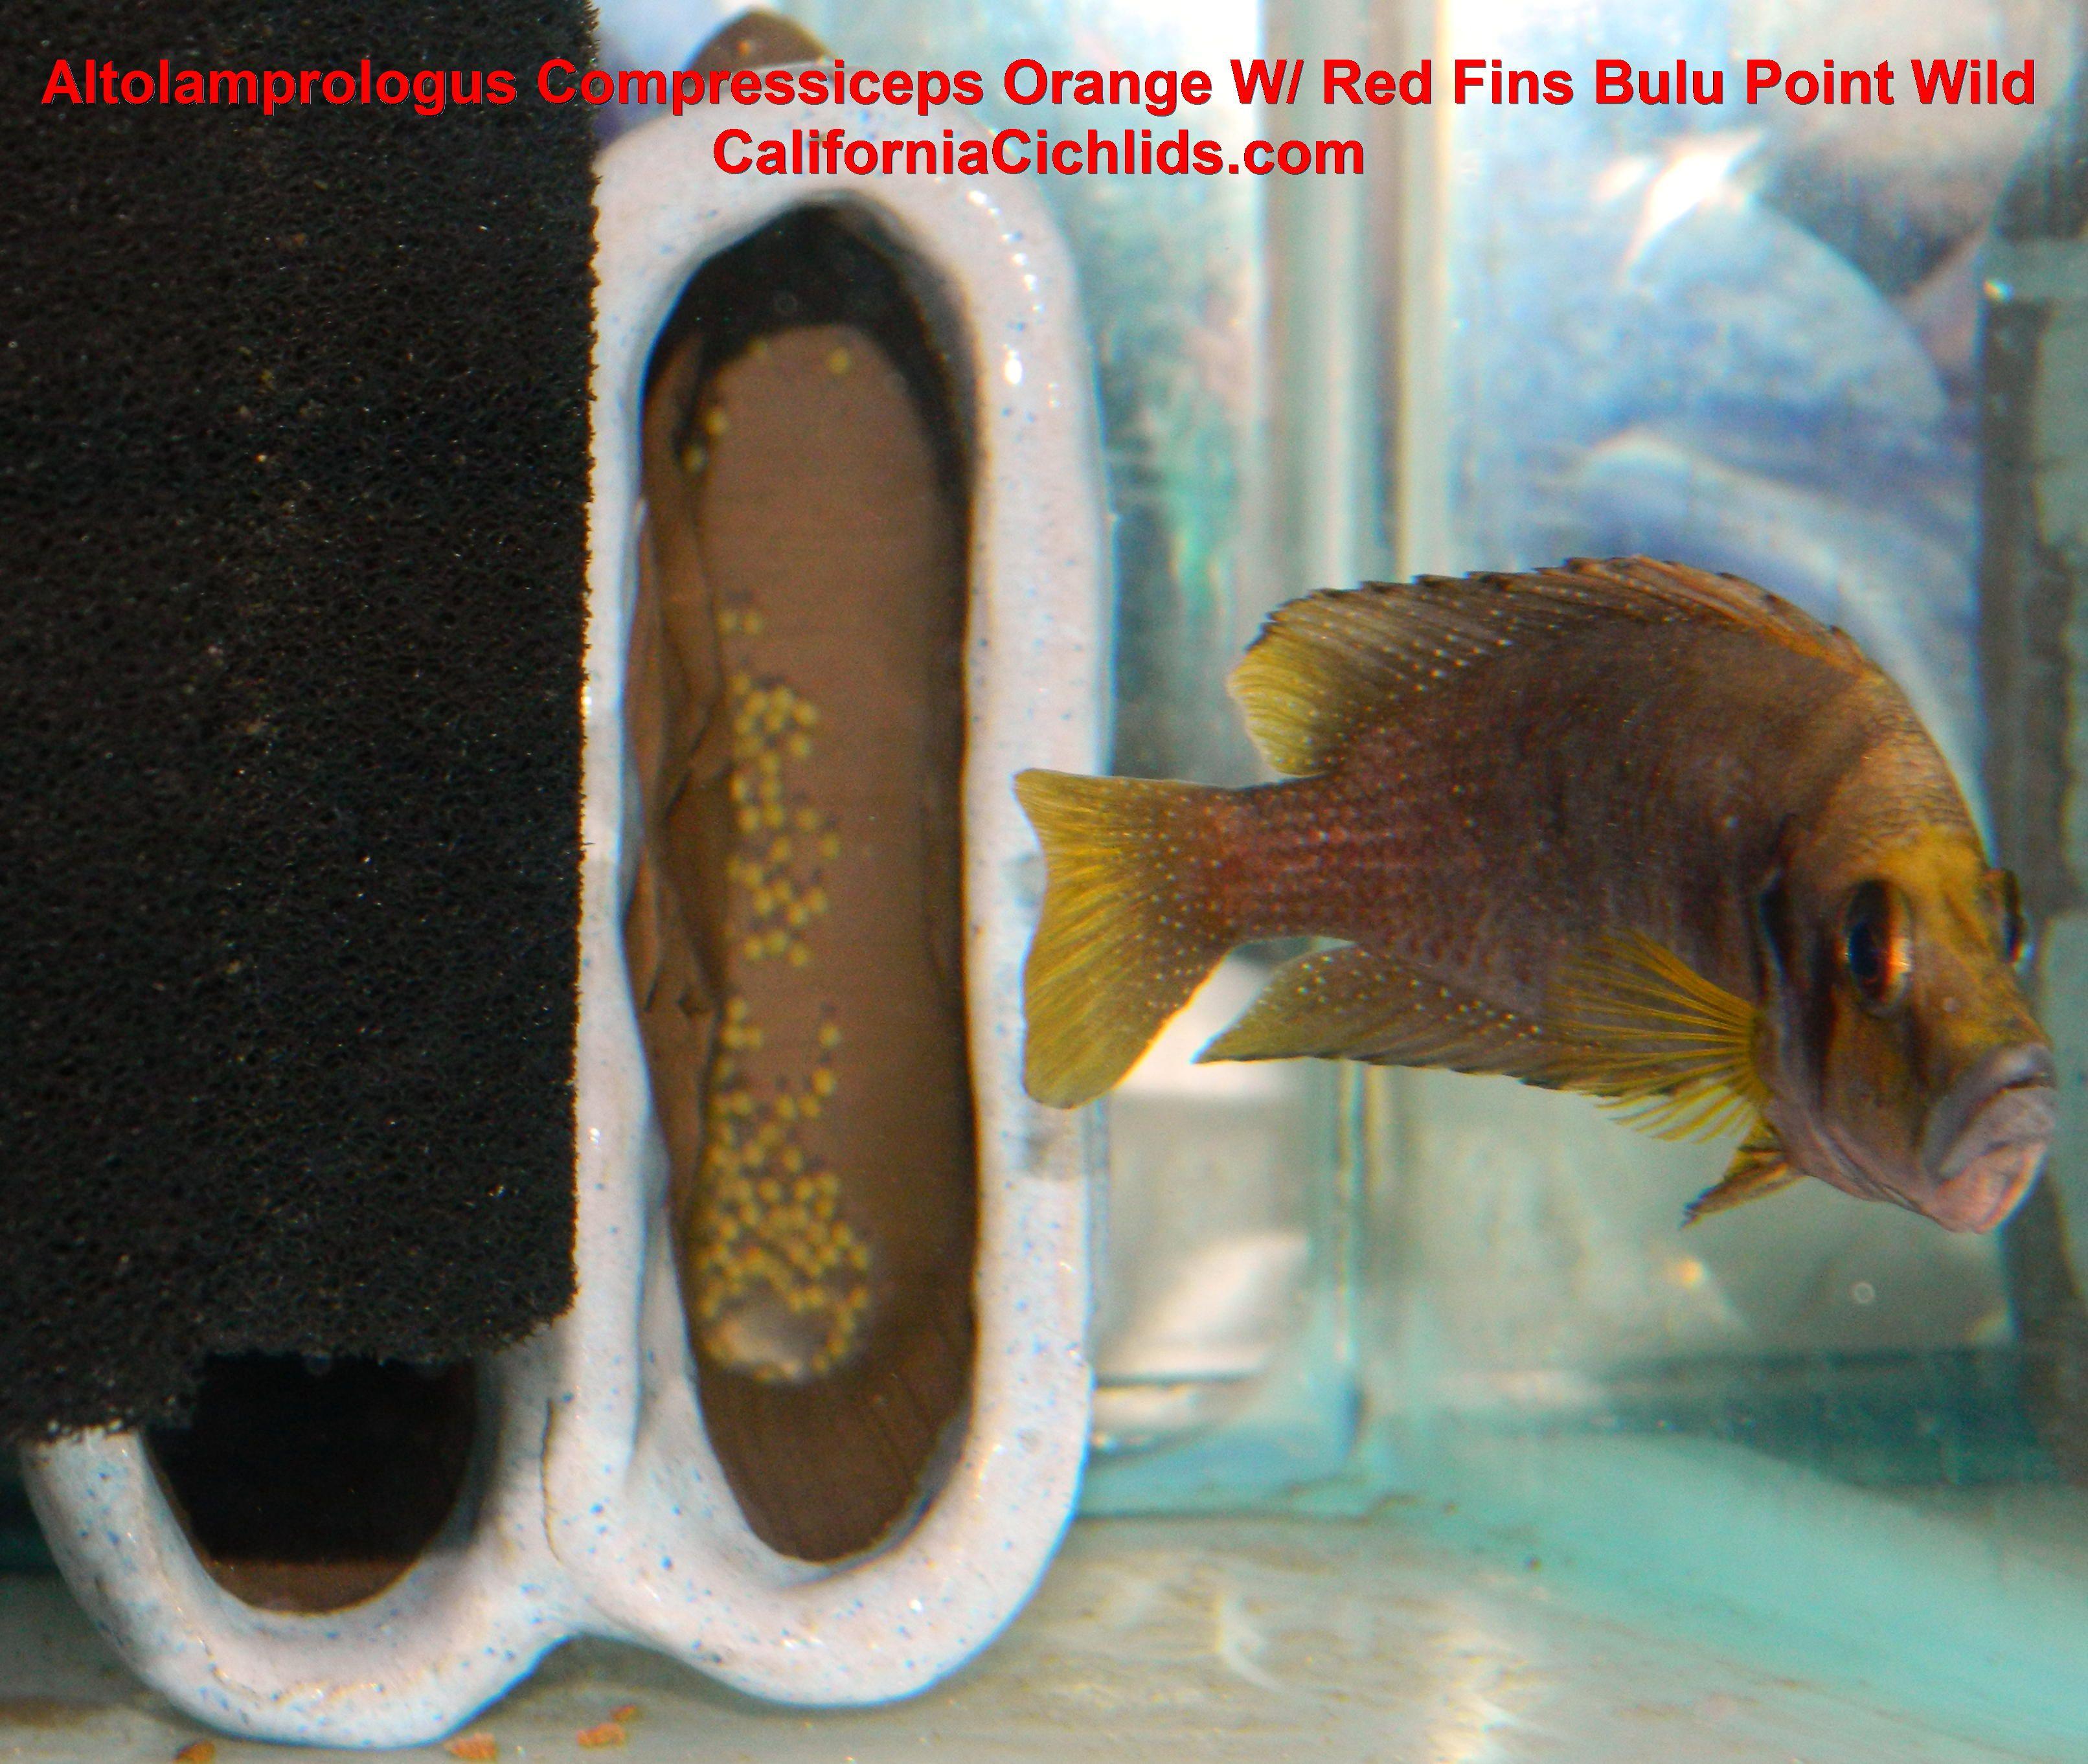 Freshwater aquarium fish silver with red fins - Altolamprologus Compressiceps Orange W Red Fins Bulu Point Wild Californiacichlids Com